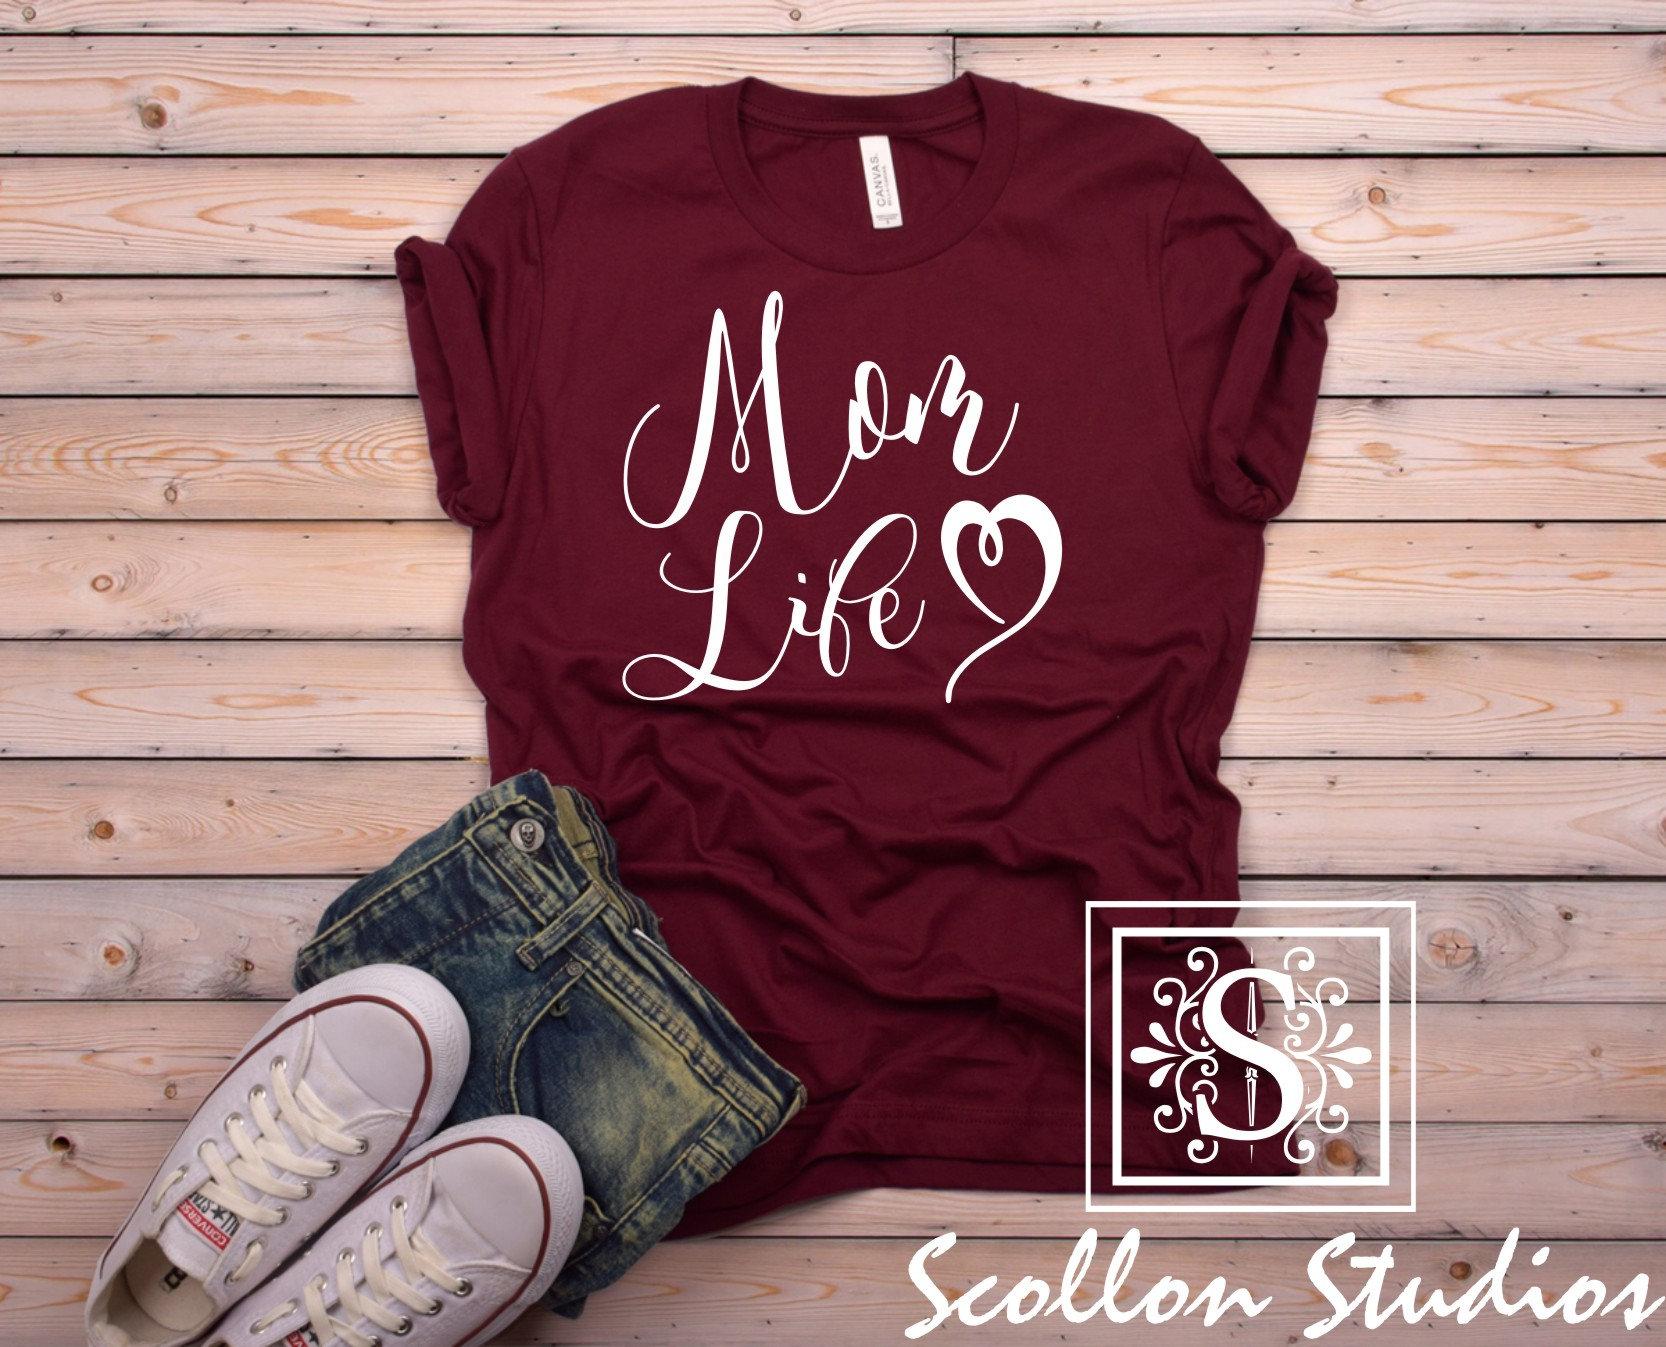 c4021199b Mom life Shirt, Mom Shirt, Shirts for Moms, Trendy Mom T-Shirts, Cool Mom  Shirts, Mothers Day Gift, Shirts for Moms, Funny Mom Shirt